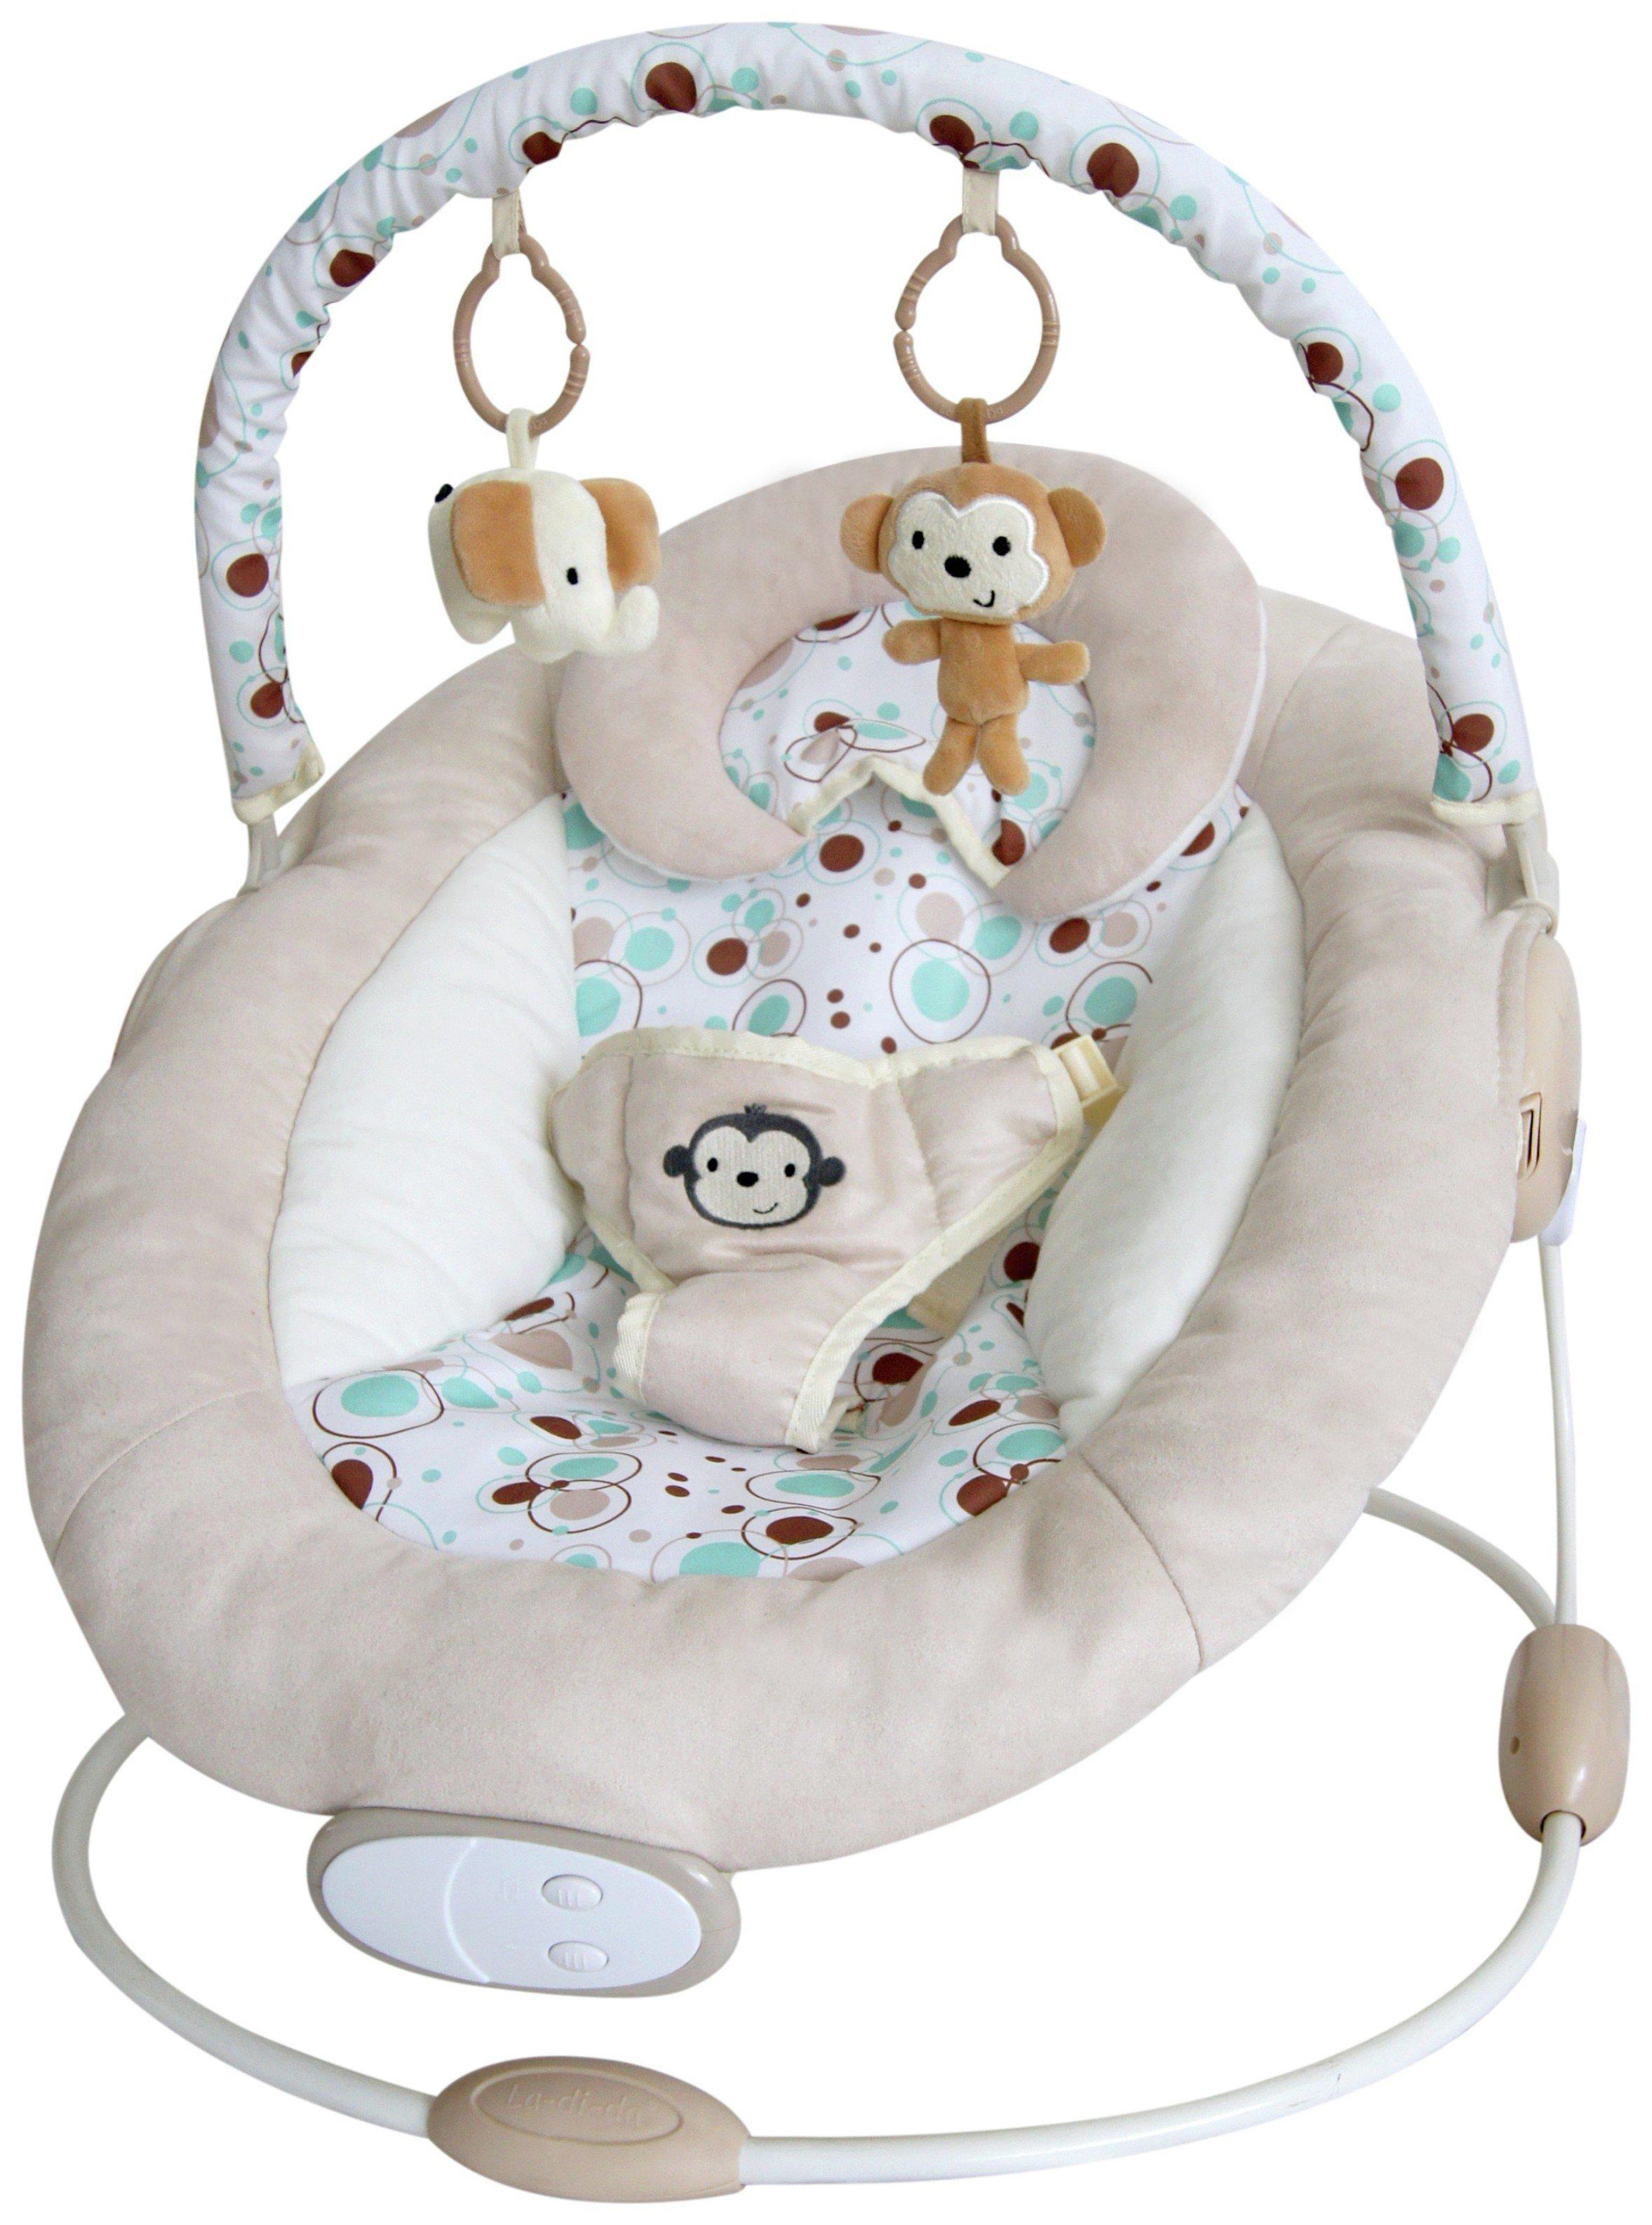 Image of BeBe Style Comfiplus Floating Baby Cradle.